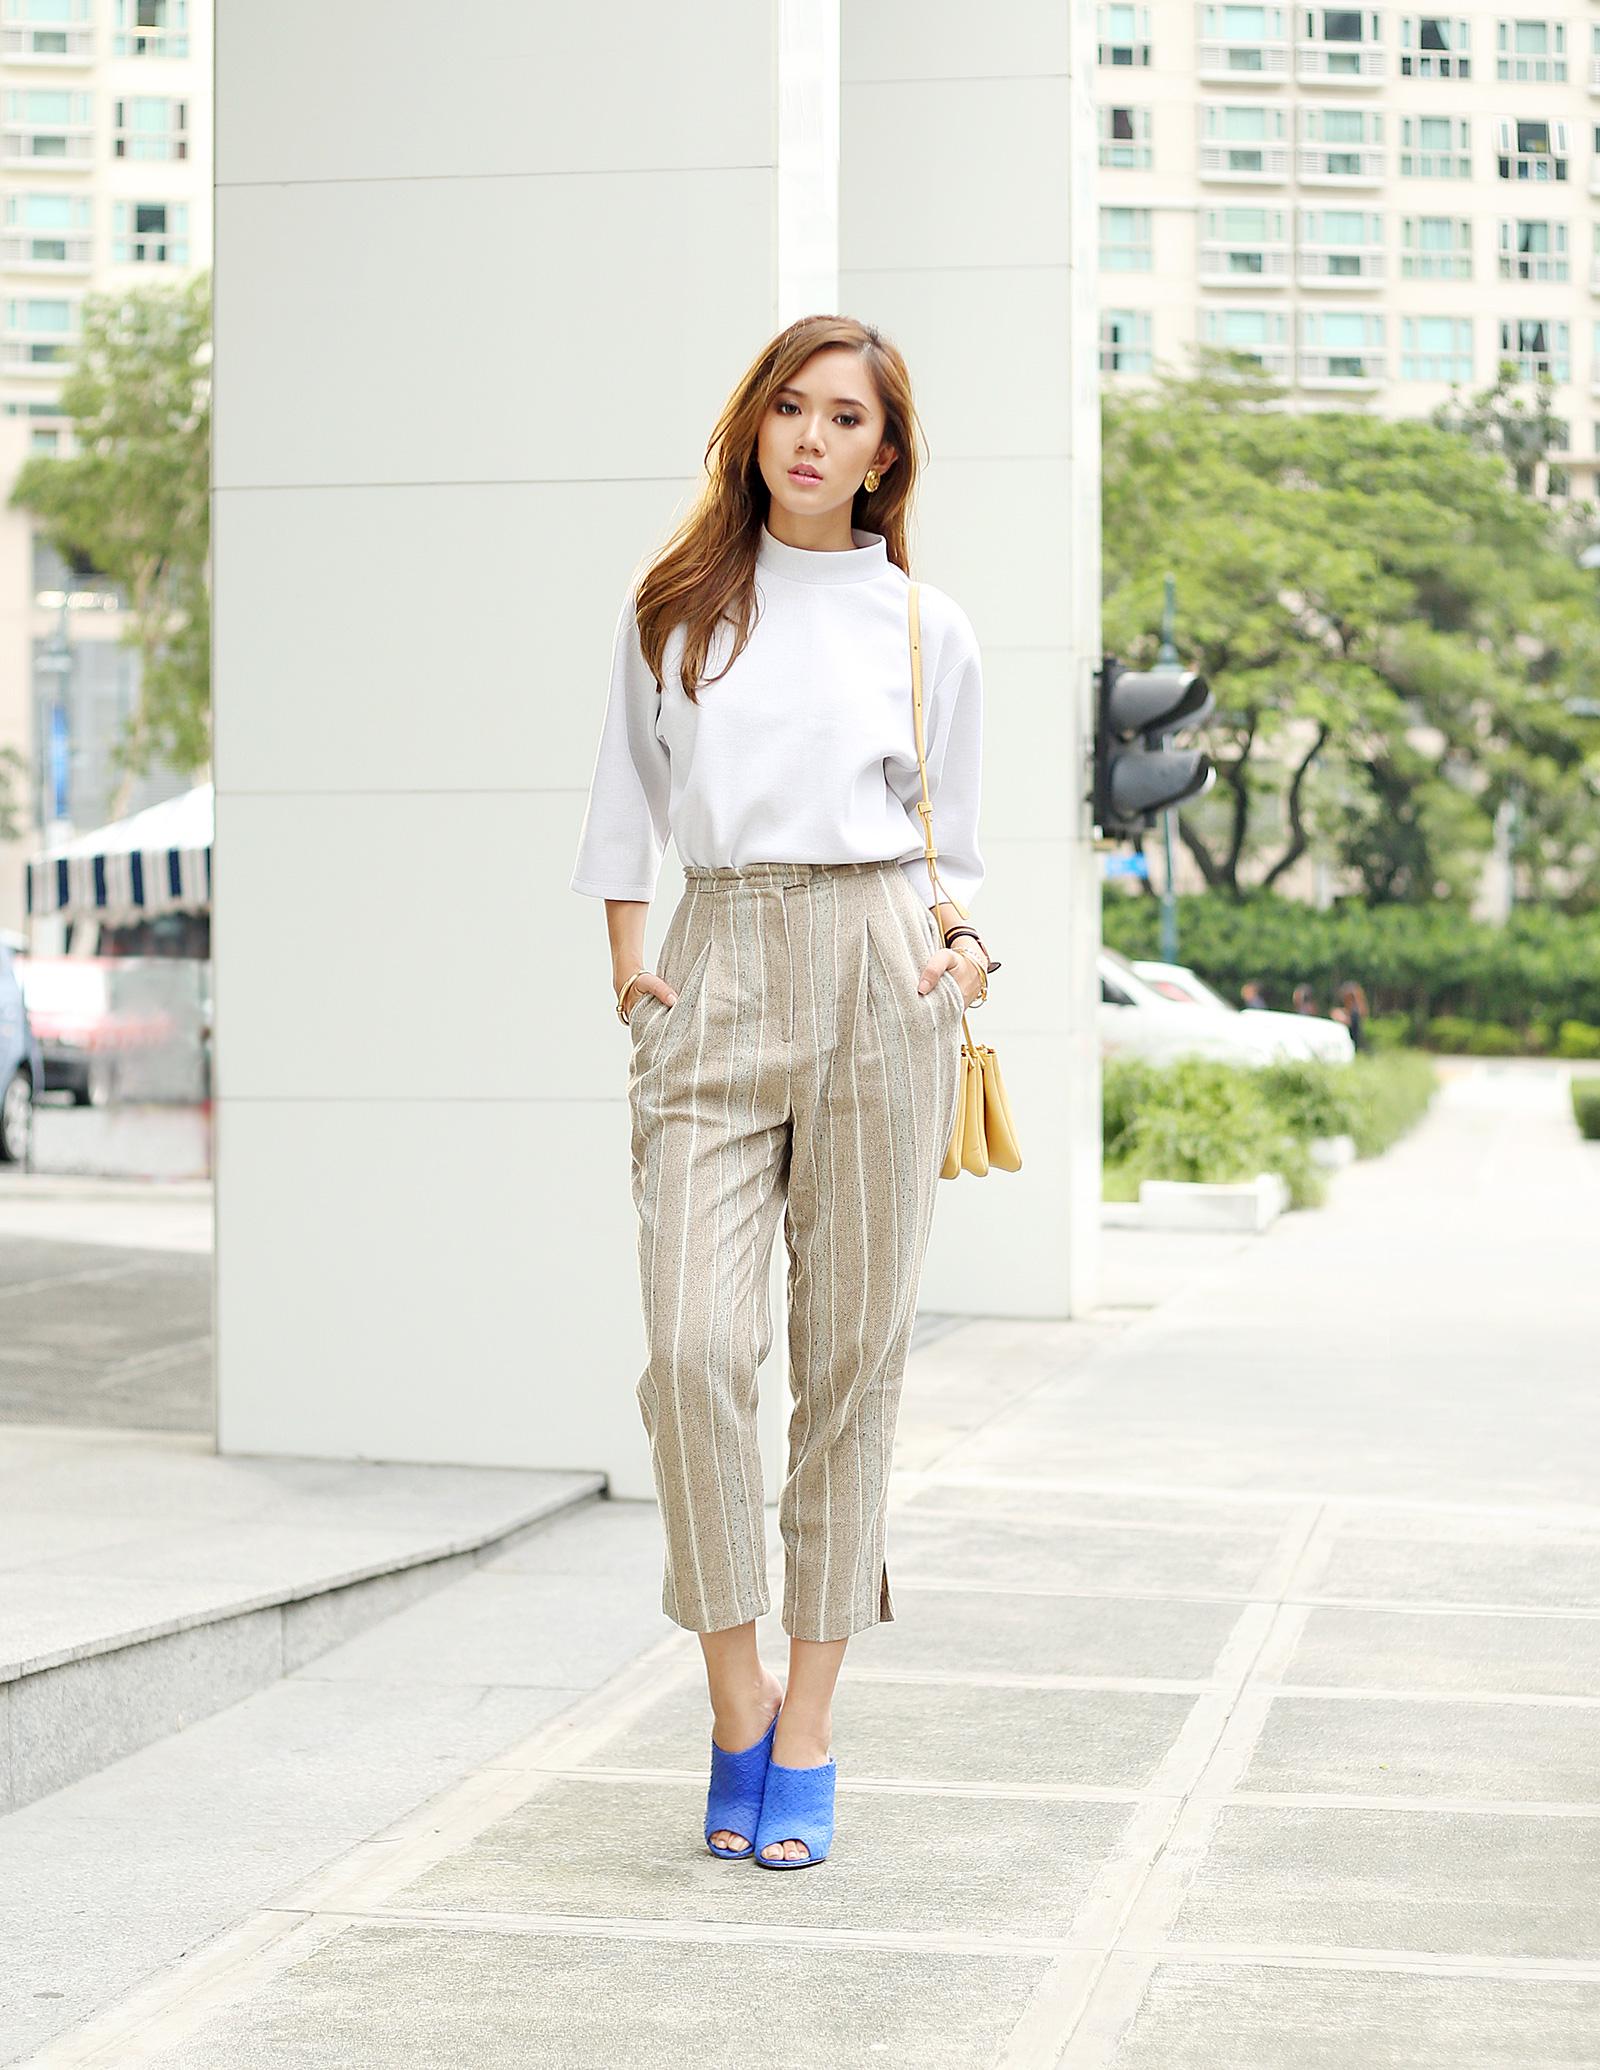 Stylenanda, Maison Martin Margiela, Celine Fashion | www.itscamilleco.com